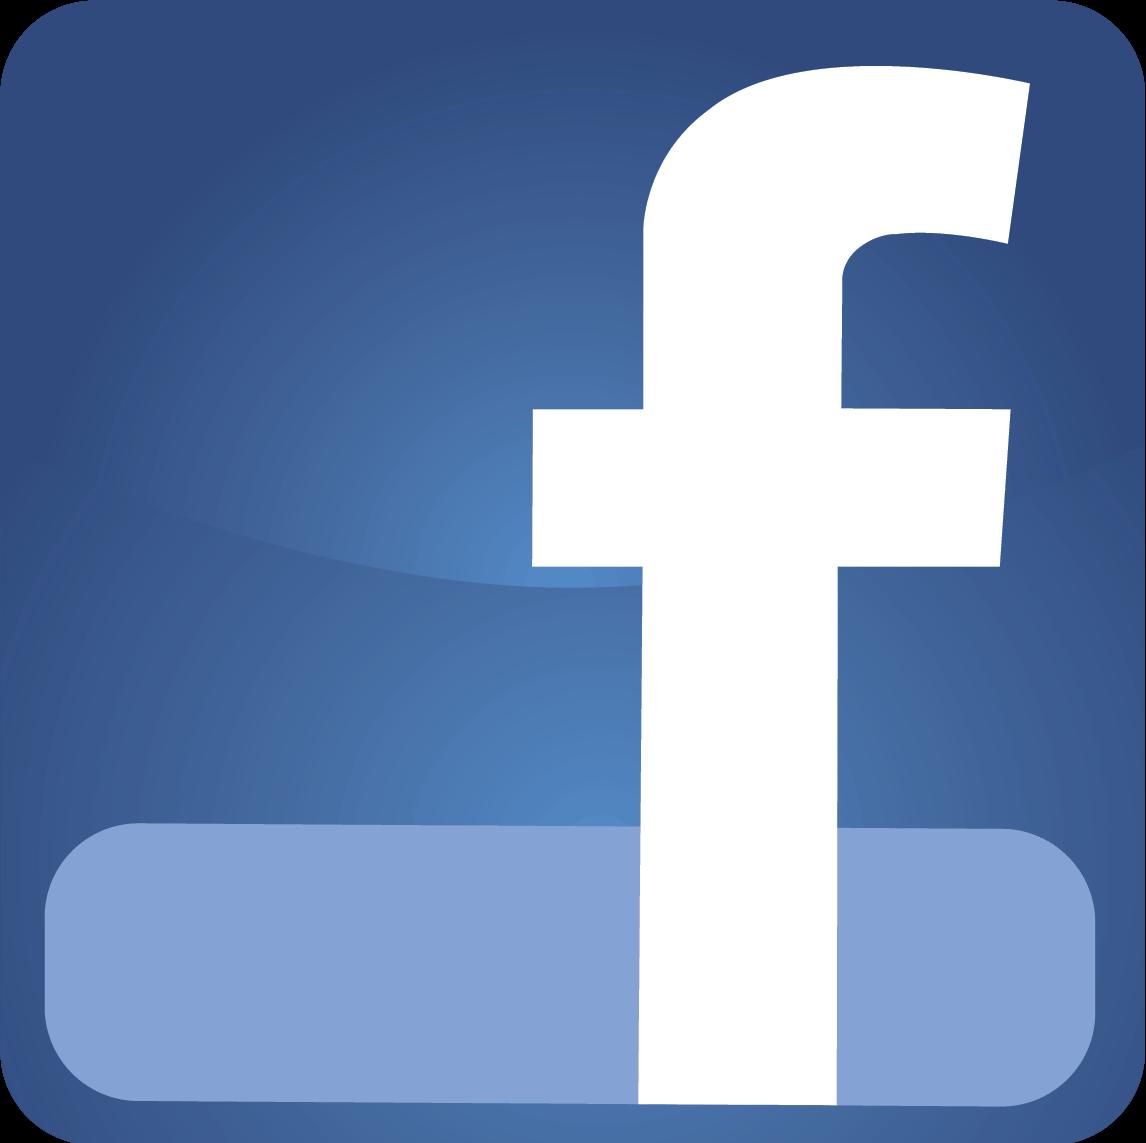 Chris' Facebook